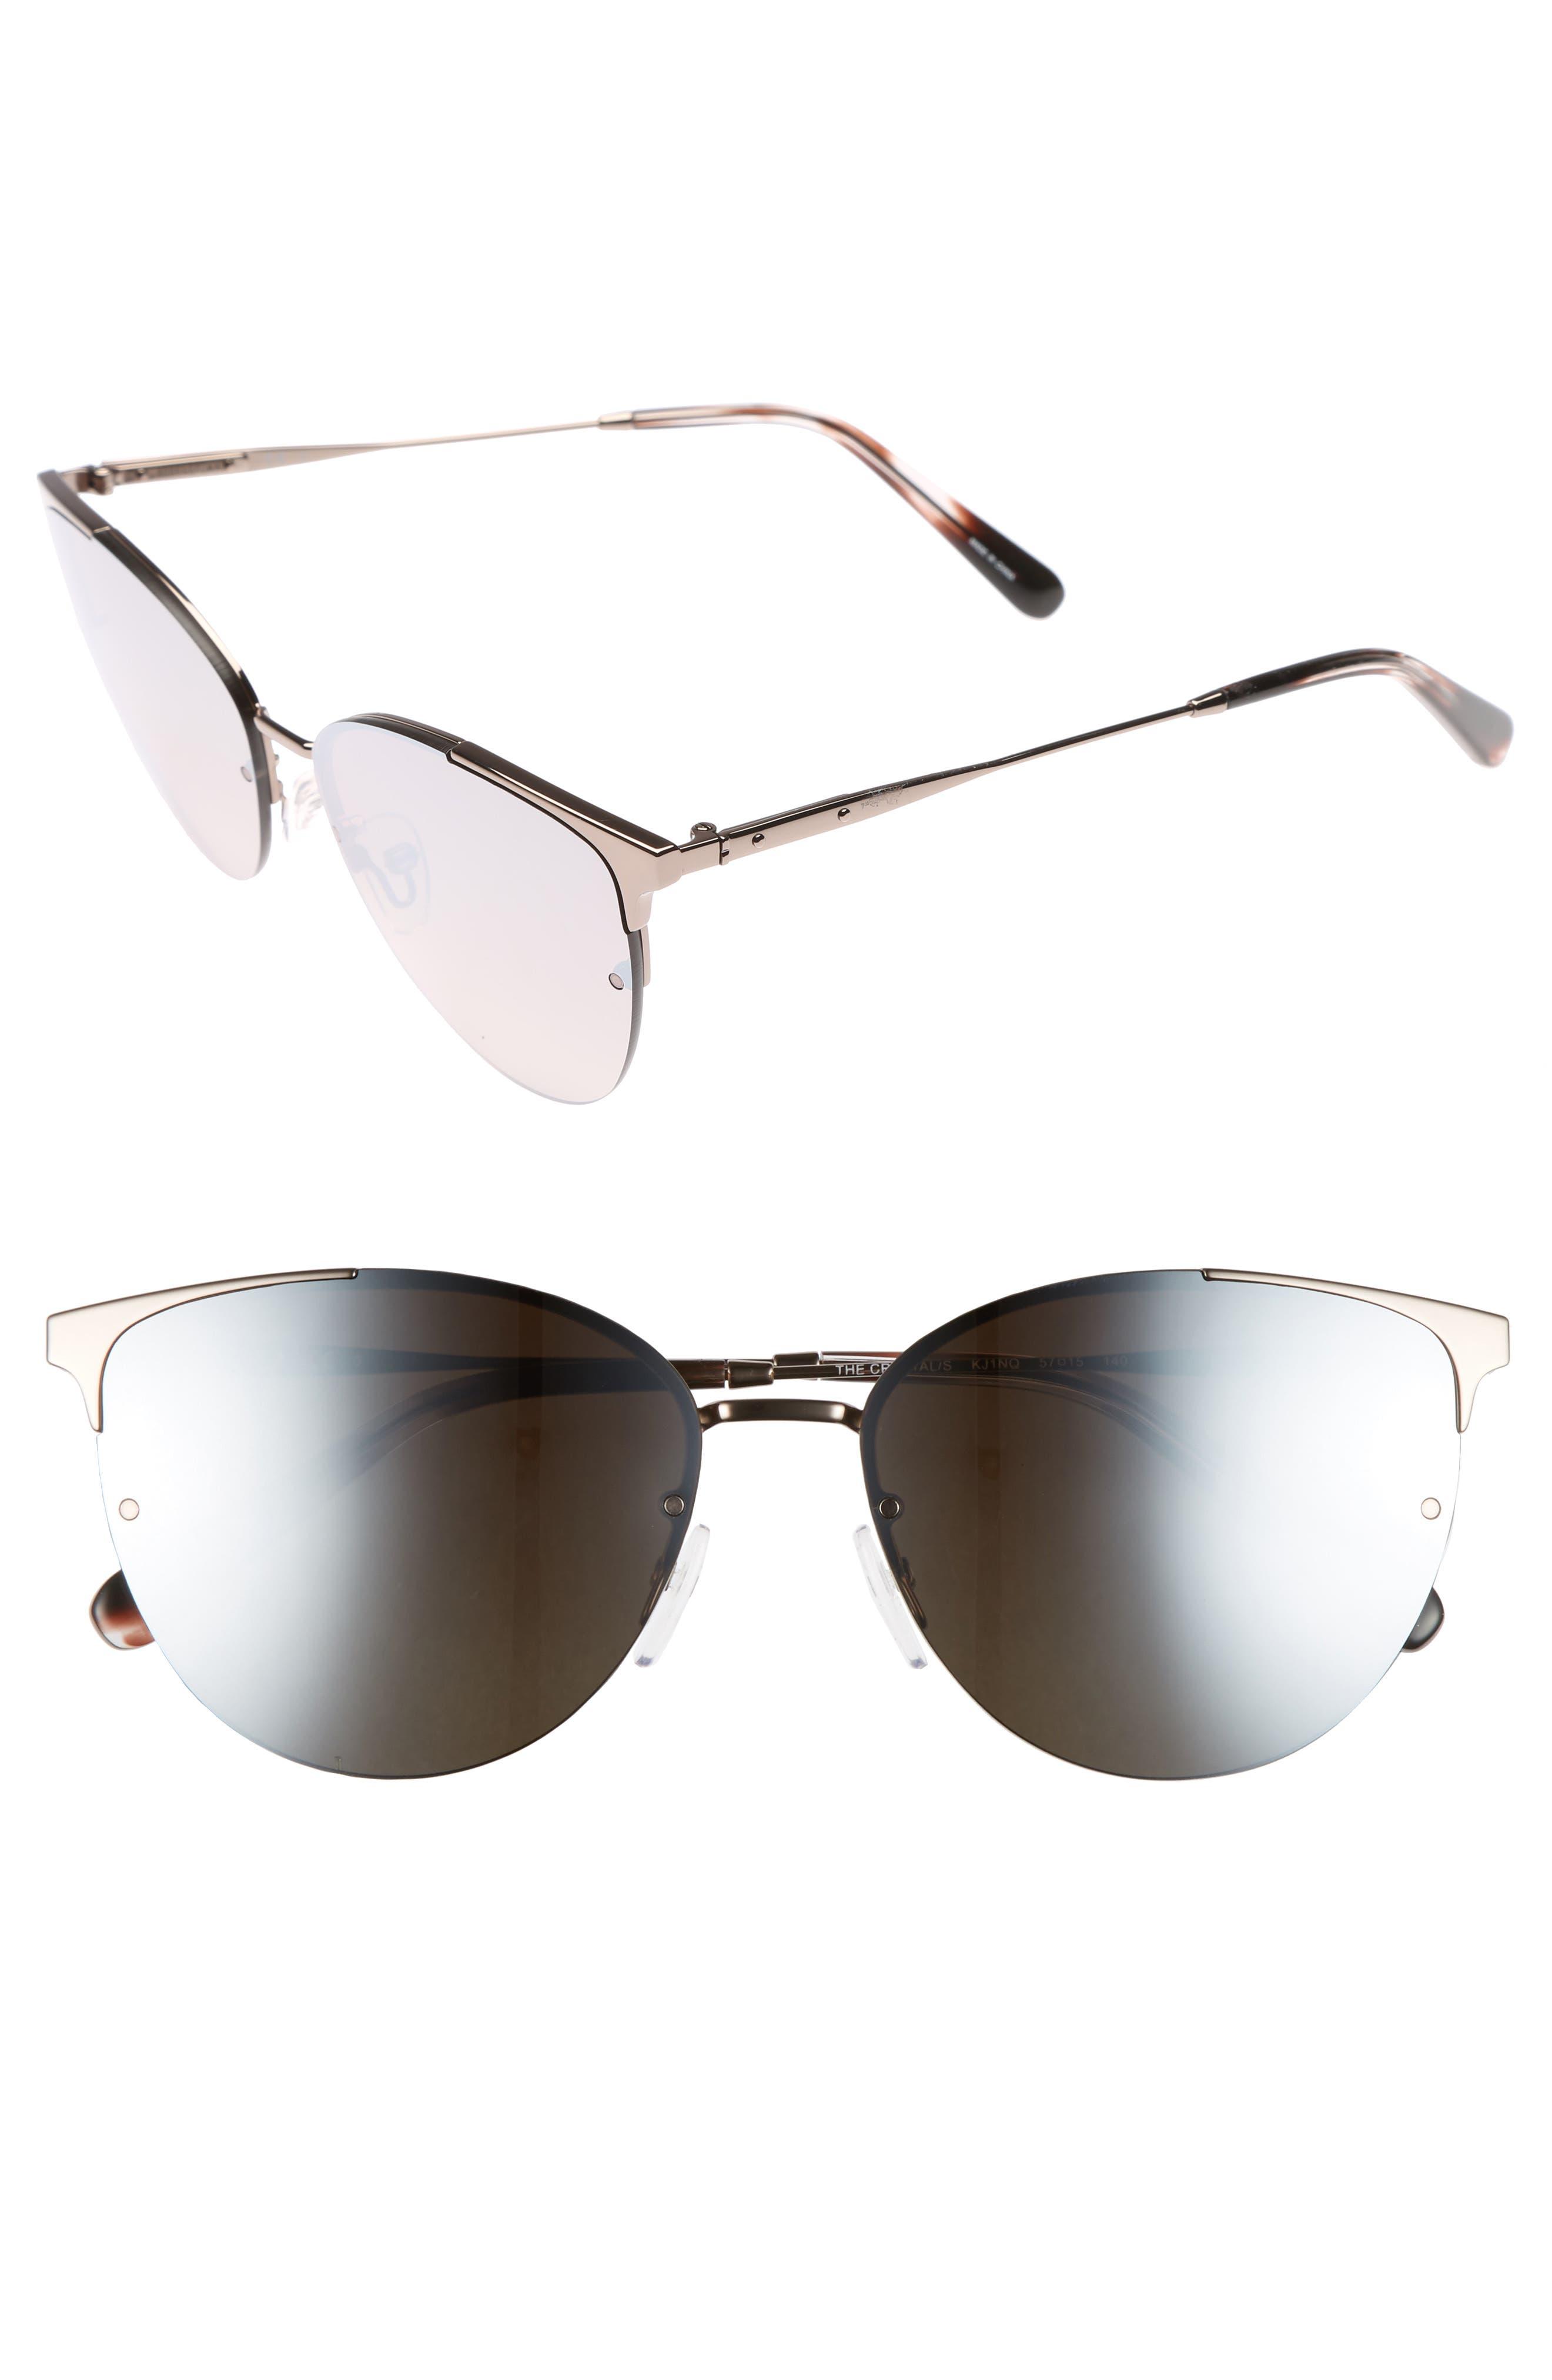 Bobbi Brown The Crystal 57mm Cat Eye Sunglasses